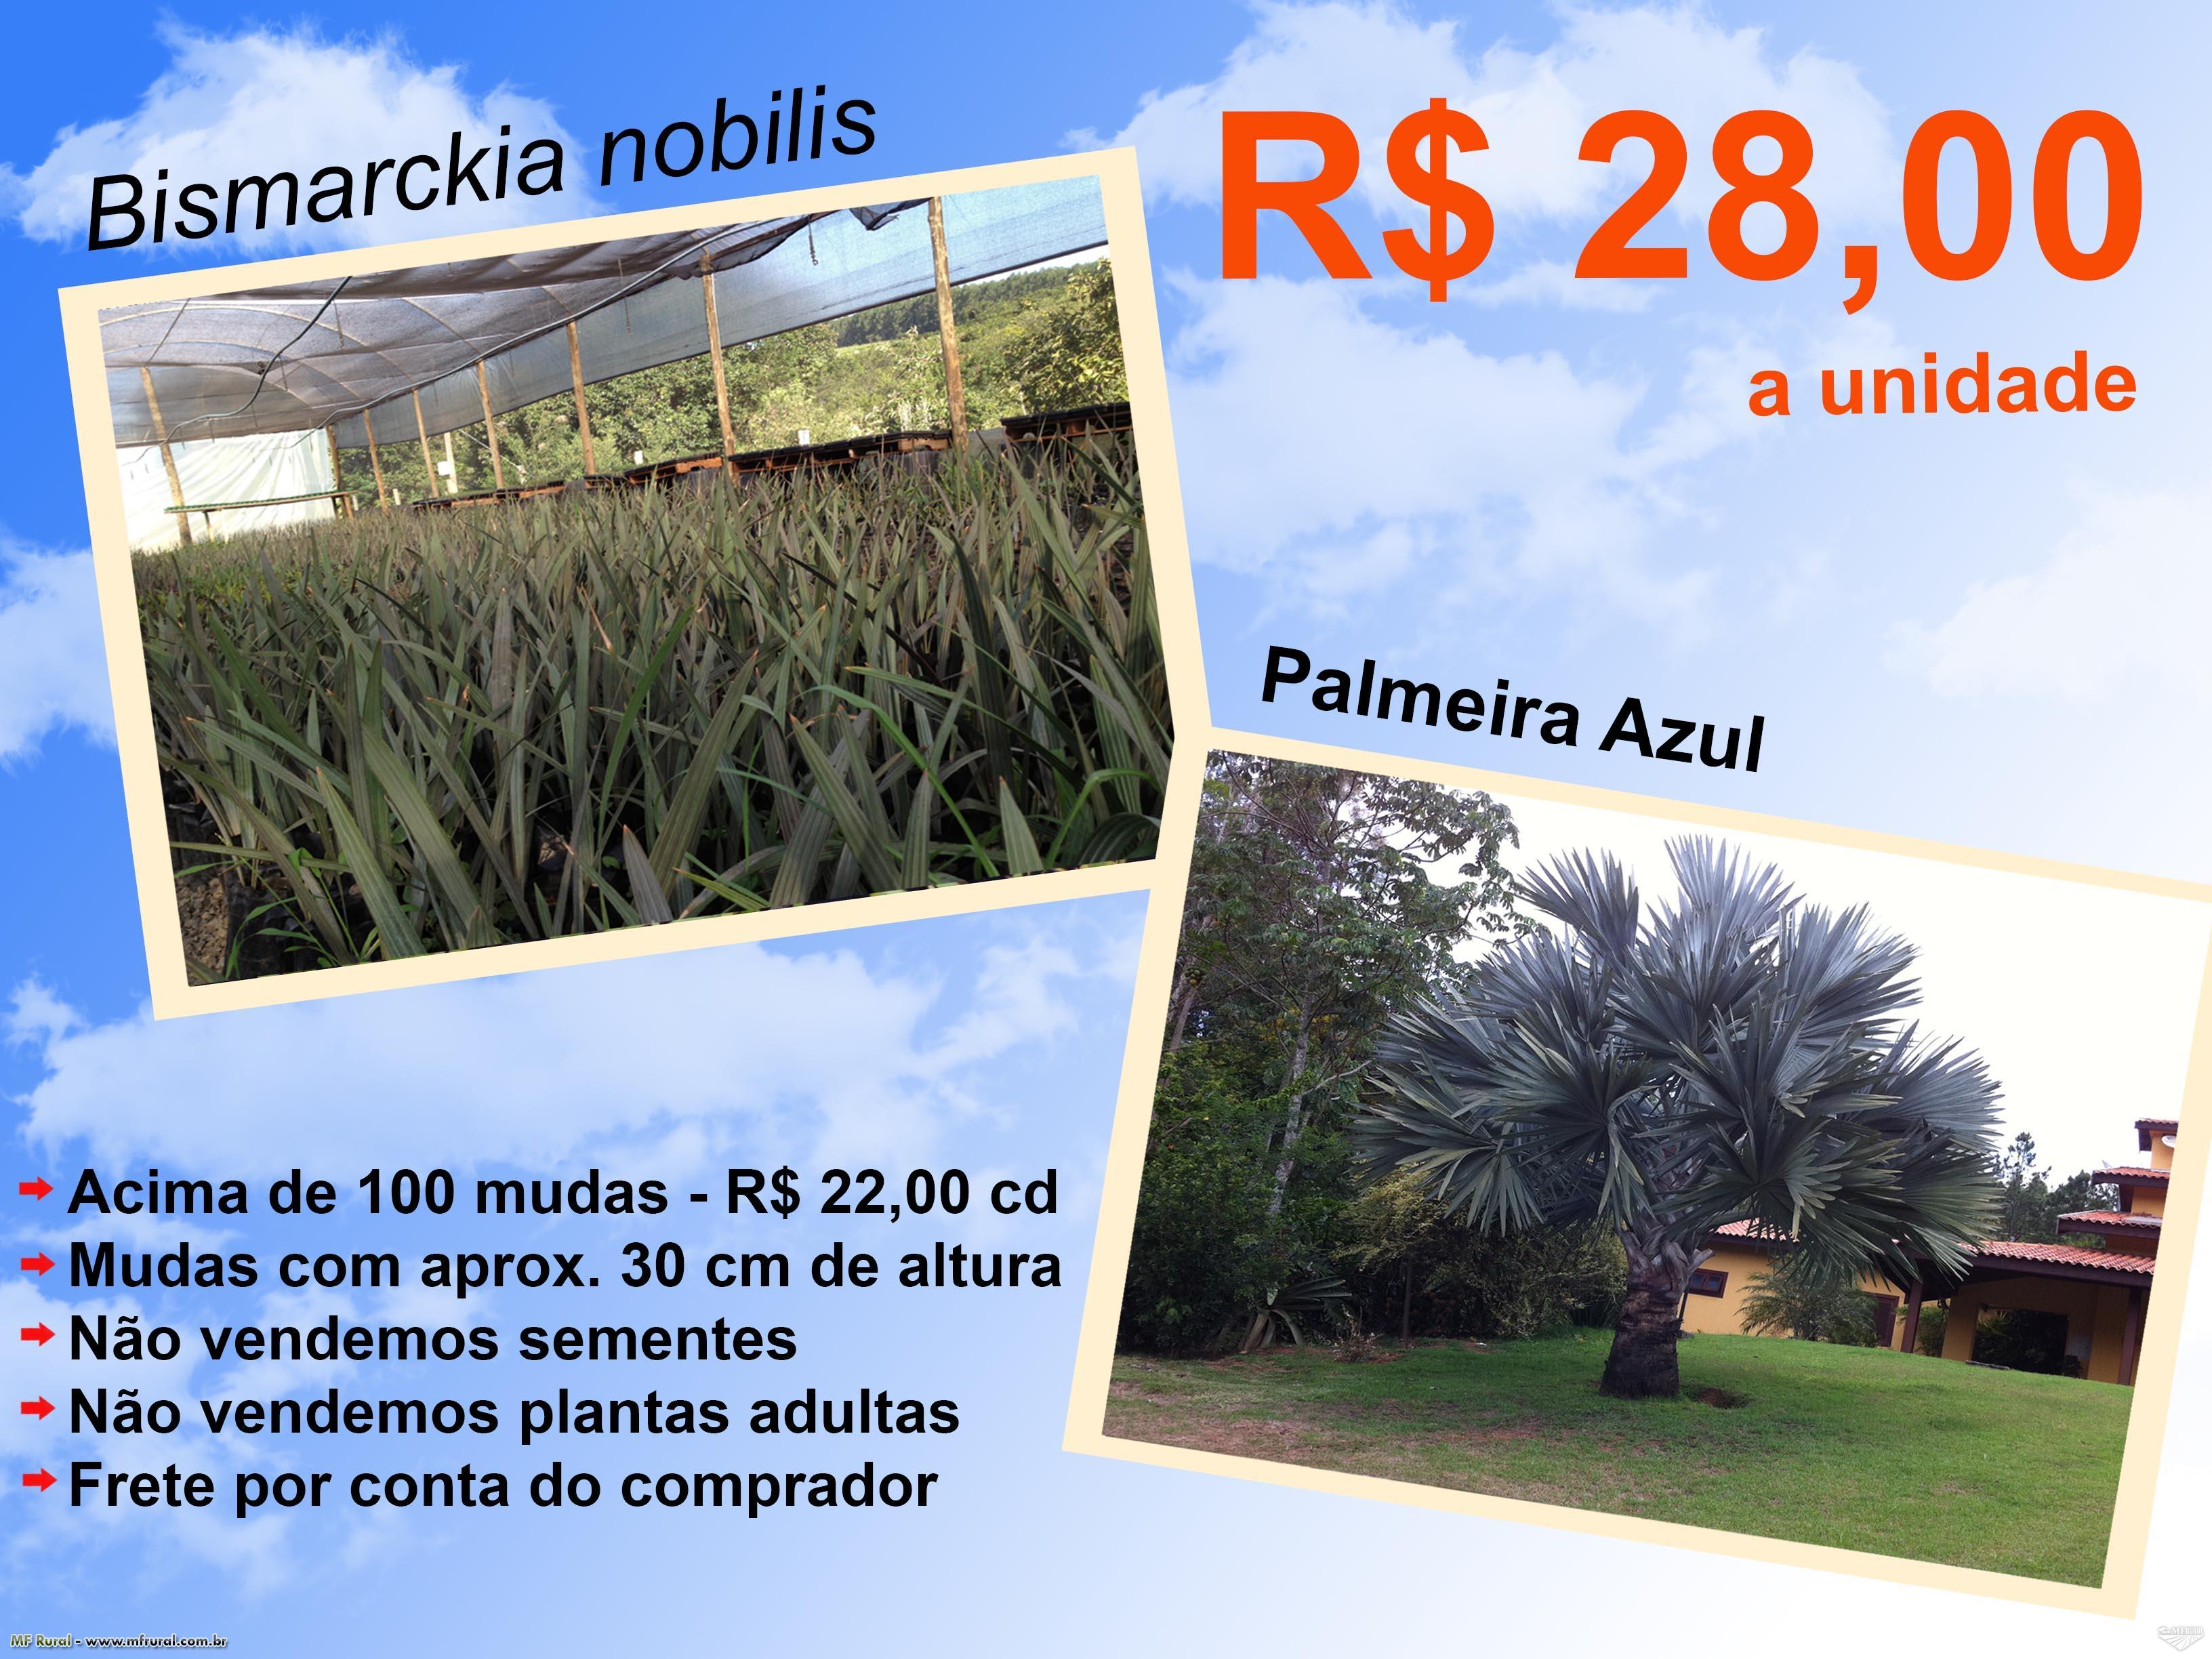 MUDAS DE PALMEIRA AZUL (Bismarckia nobilis), Drac. draco, Garrafa, Washingtonia